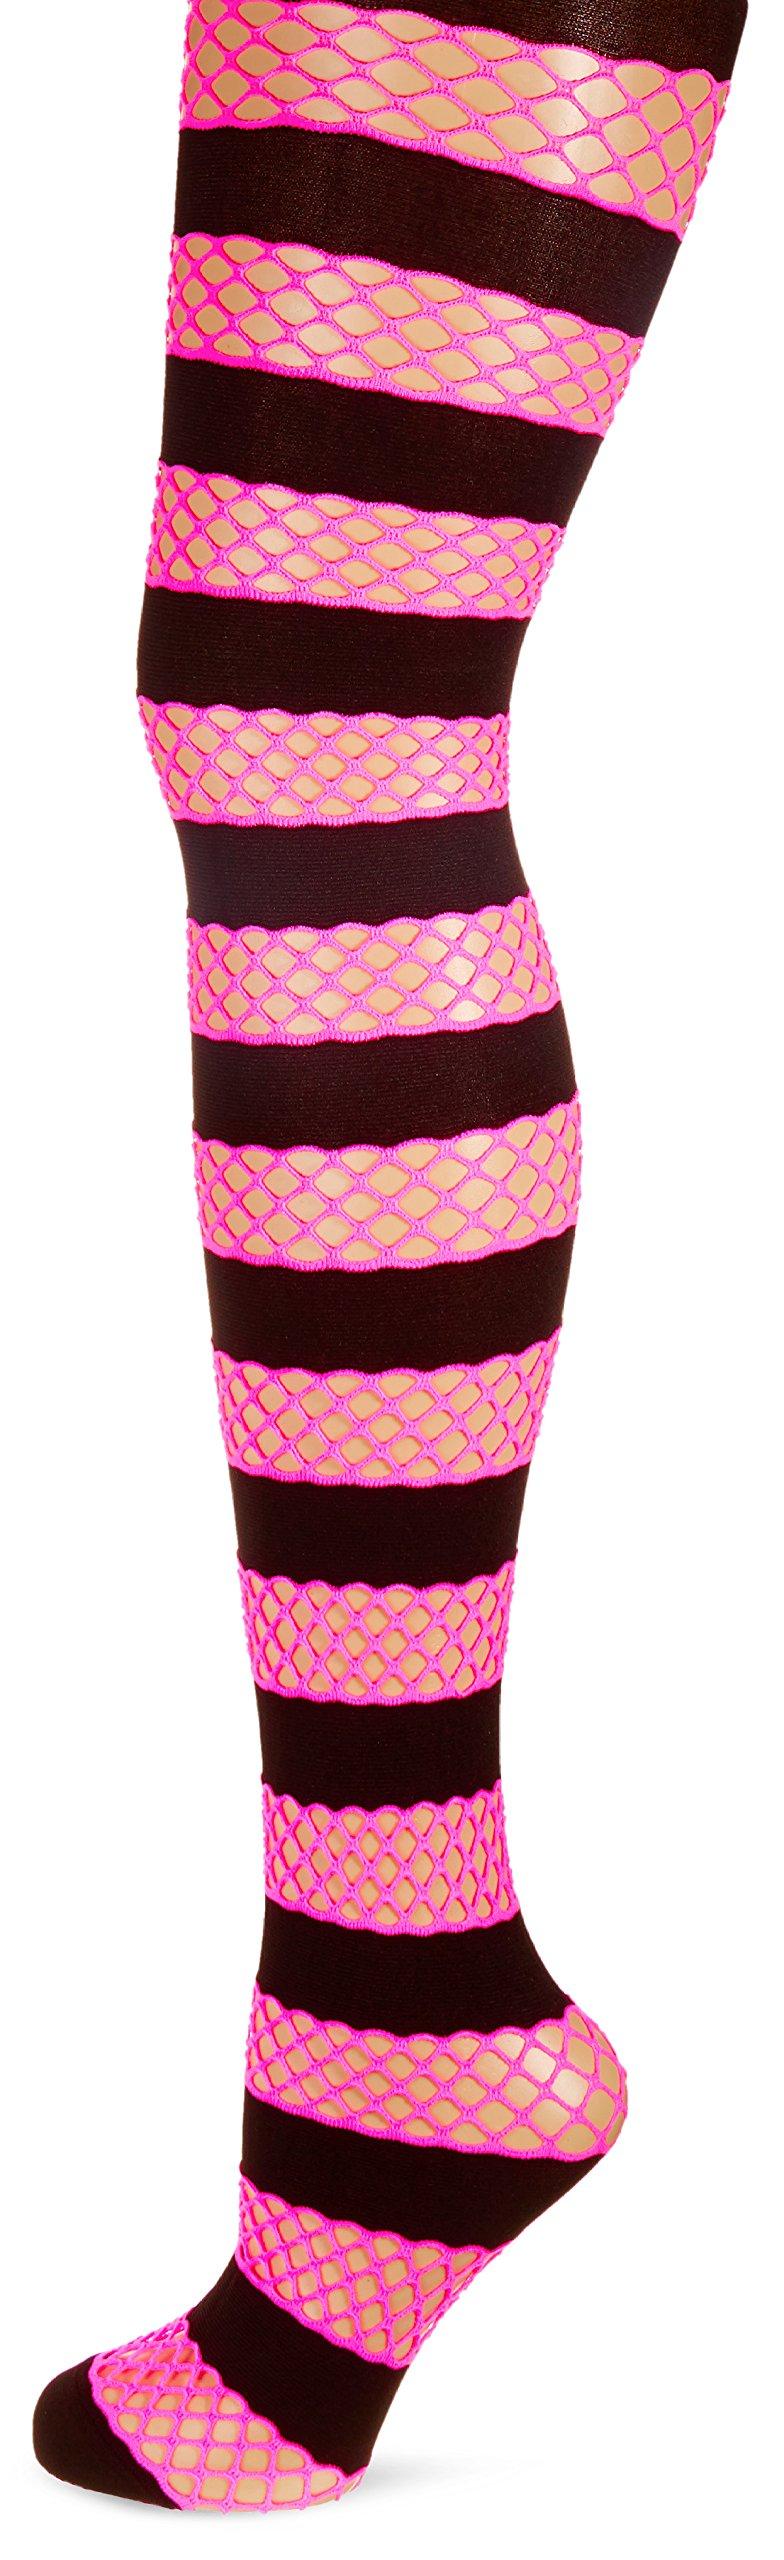 Striped Net Pantyhose Black/N.Pink